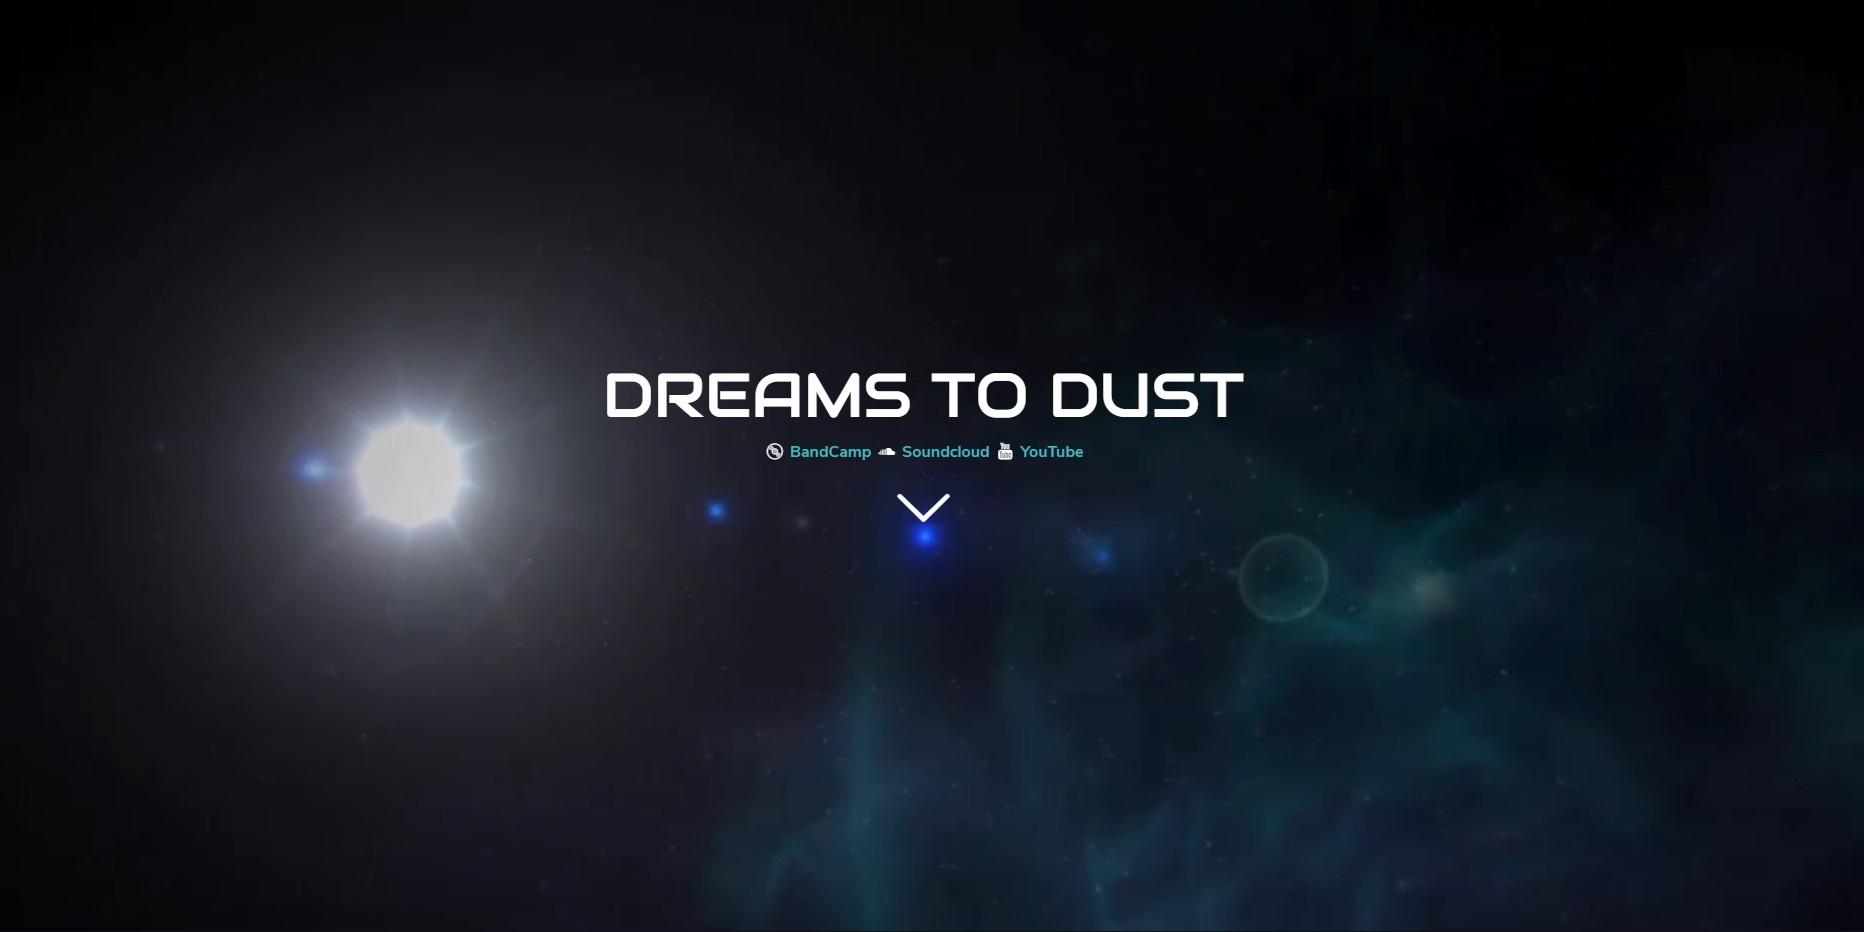 dreamstodust